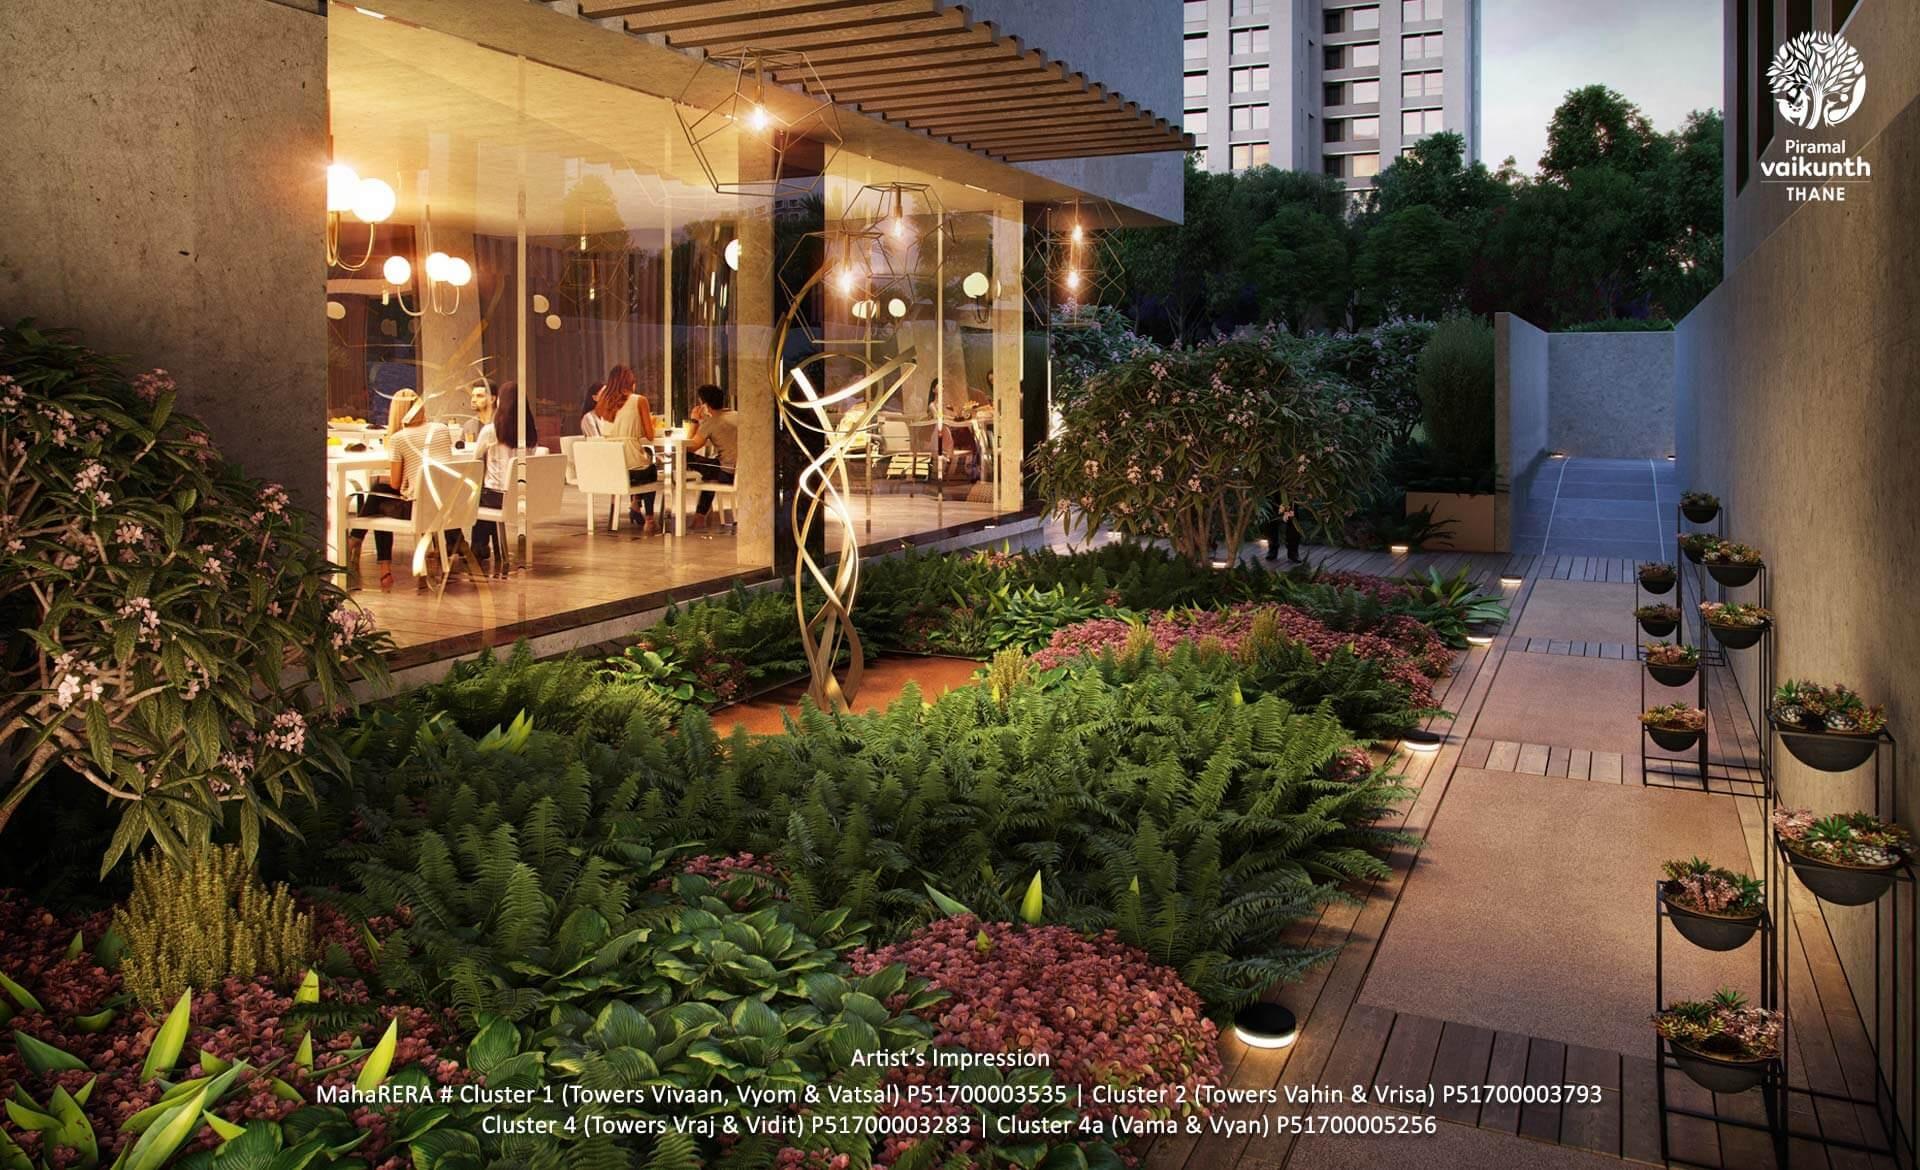 piramal vaikunth project amenities features12